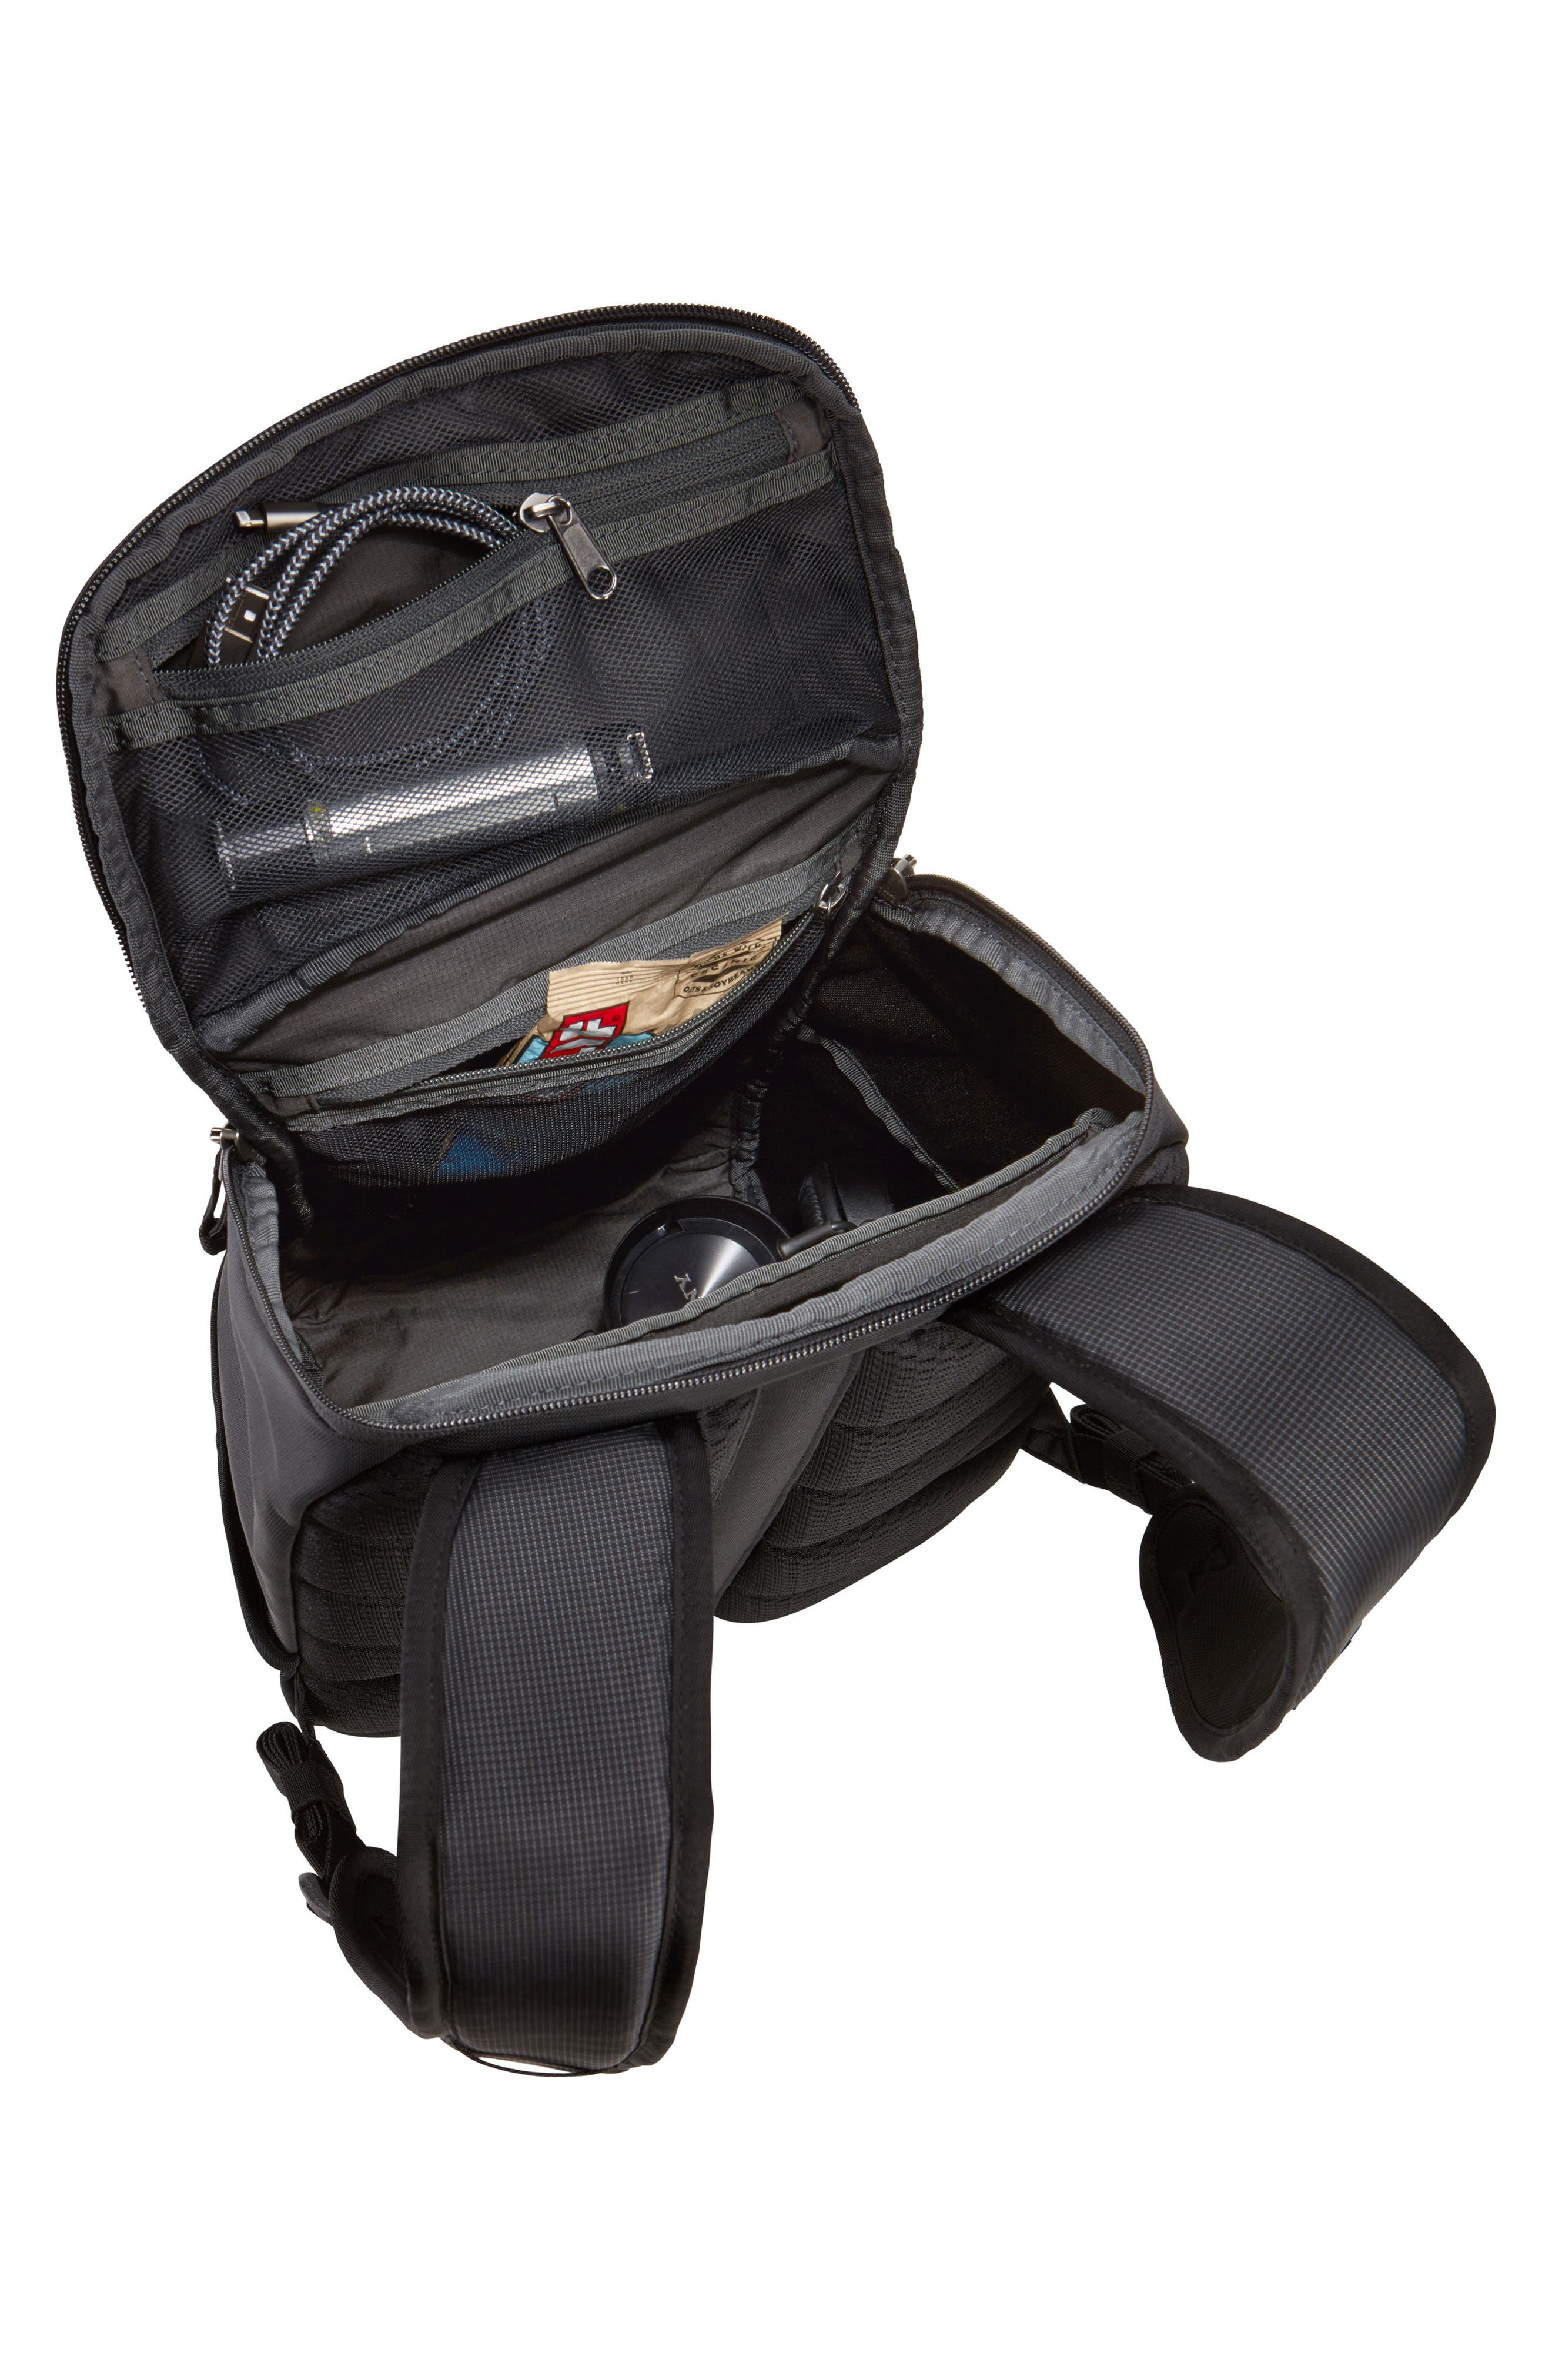 EnRoute Backpack,                             Alternate thumbnail 4, color,                             BLACK